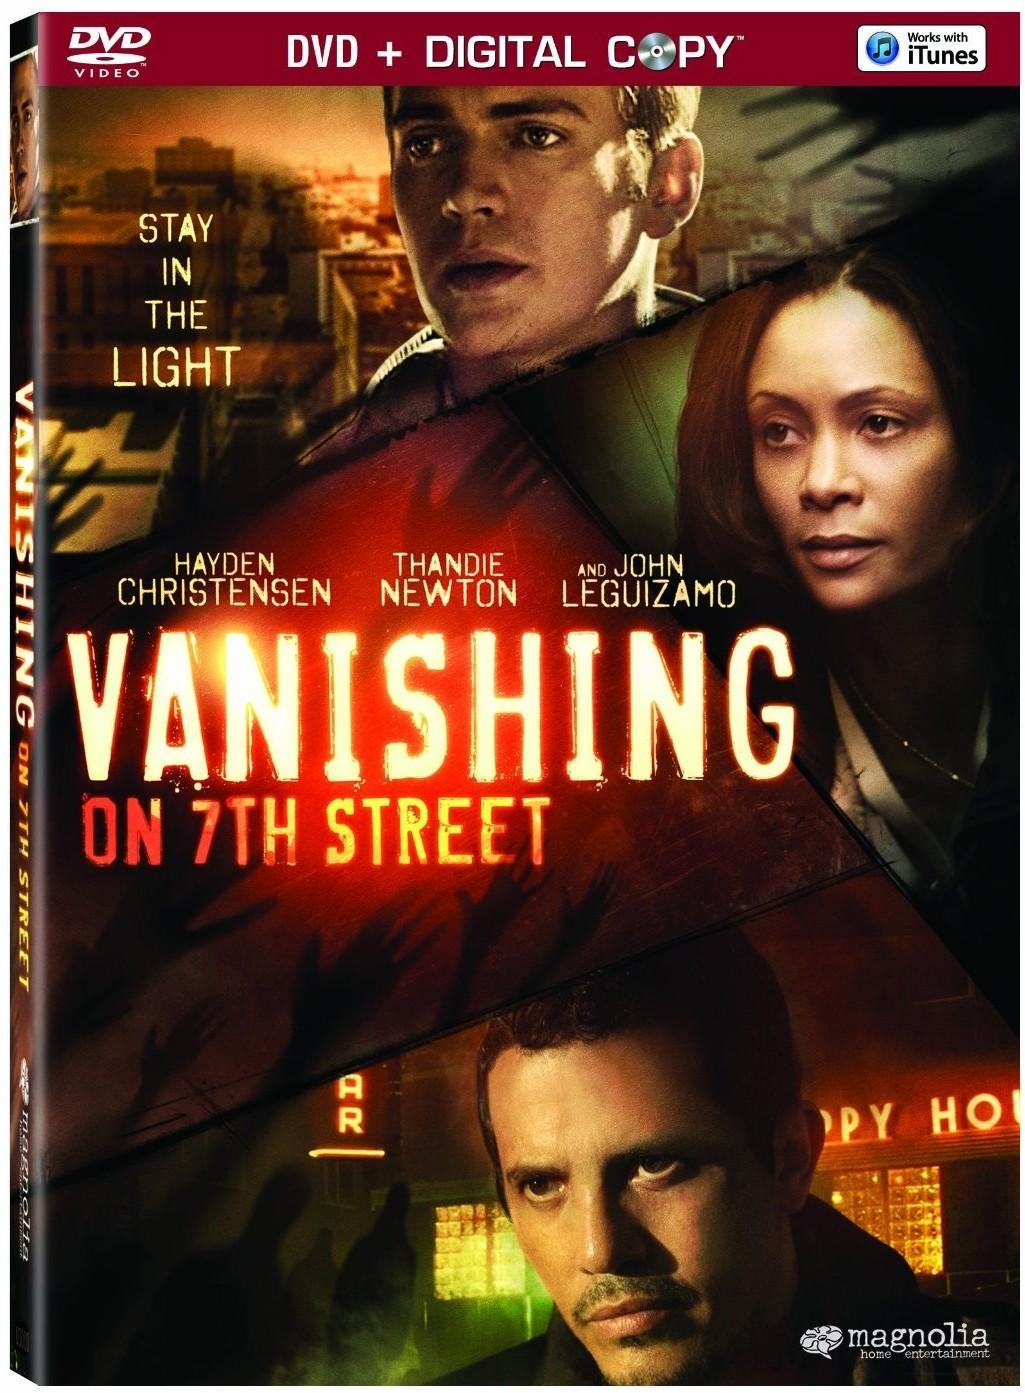 Vanishing on 7th Street จุดมนุษย์ดับ [HD]